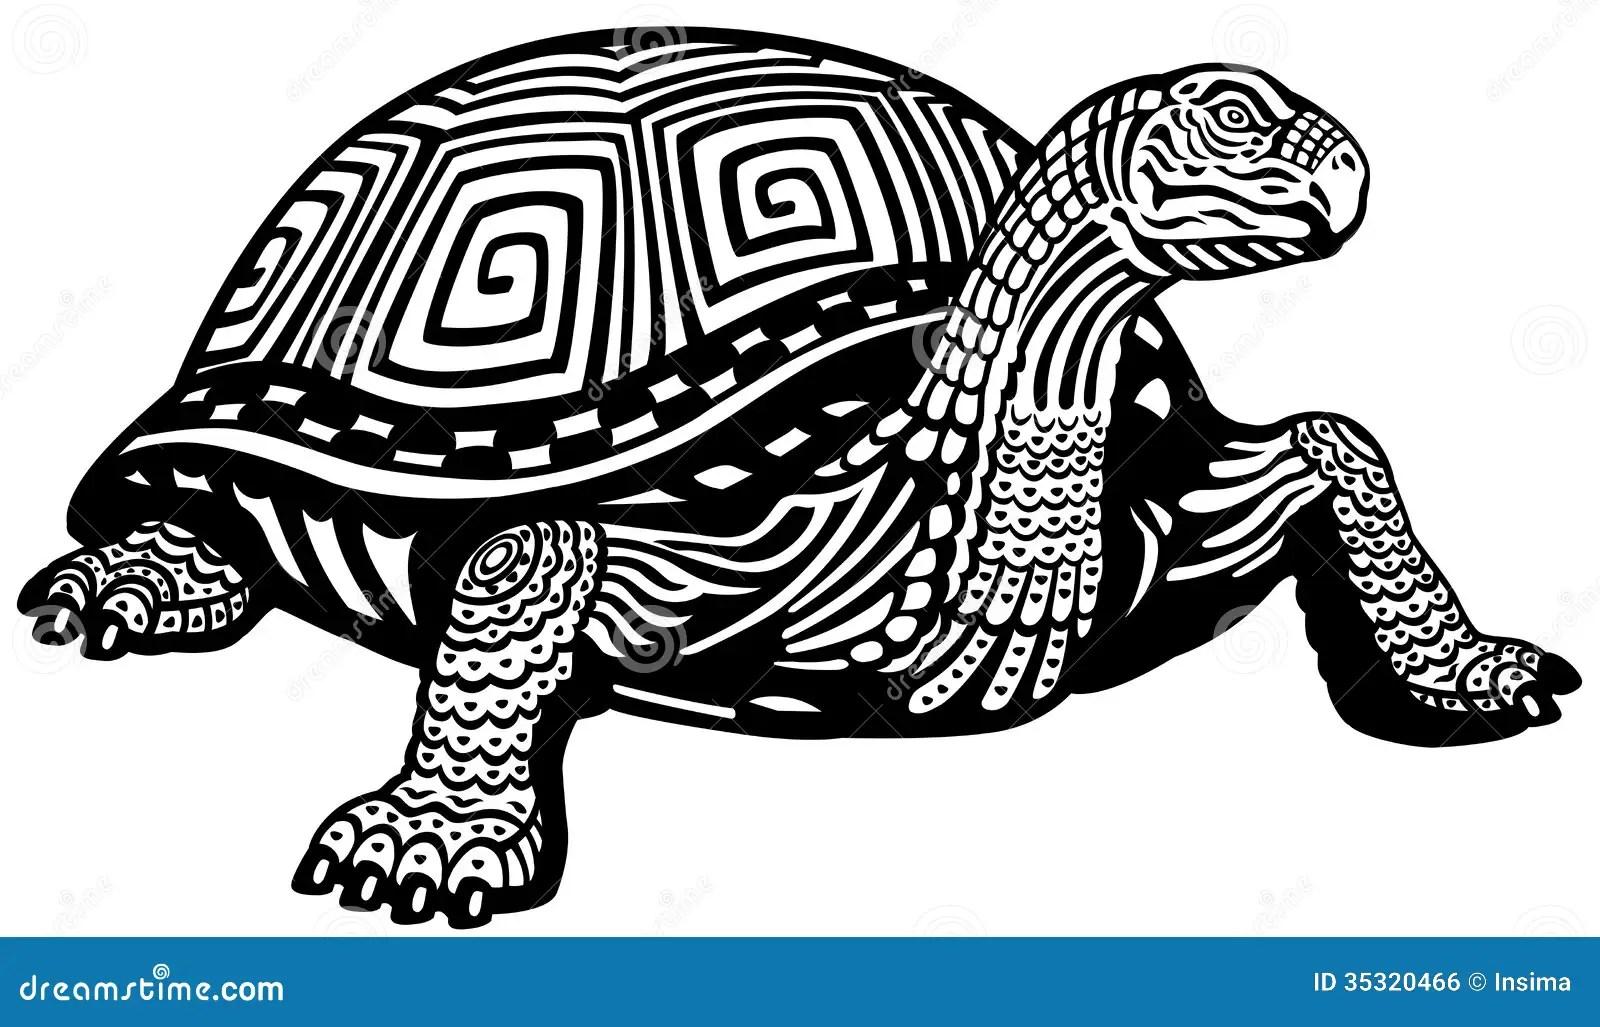 Turtle Black White Royalty Free Stock Image